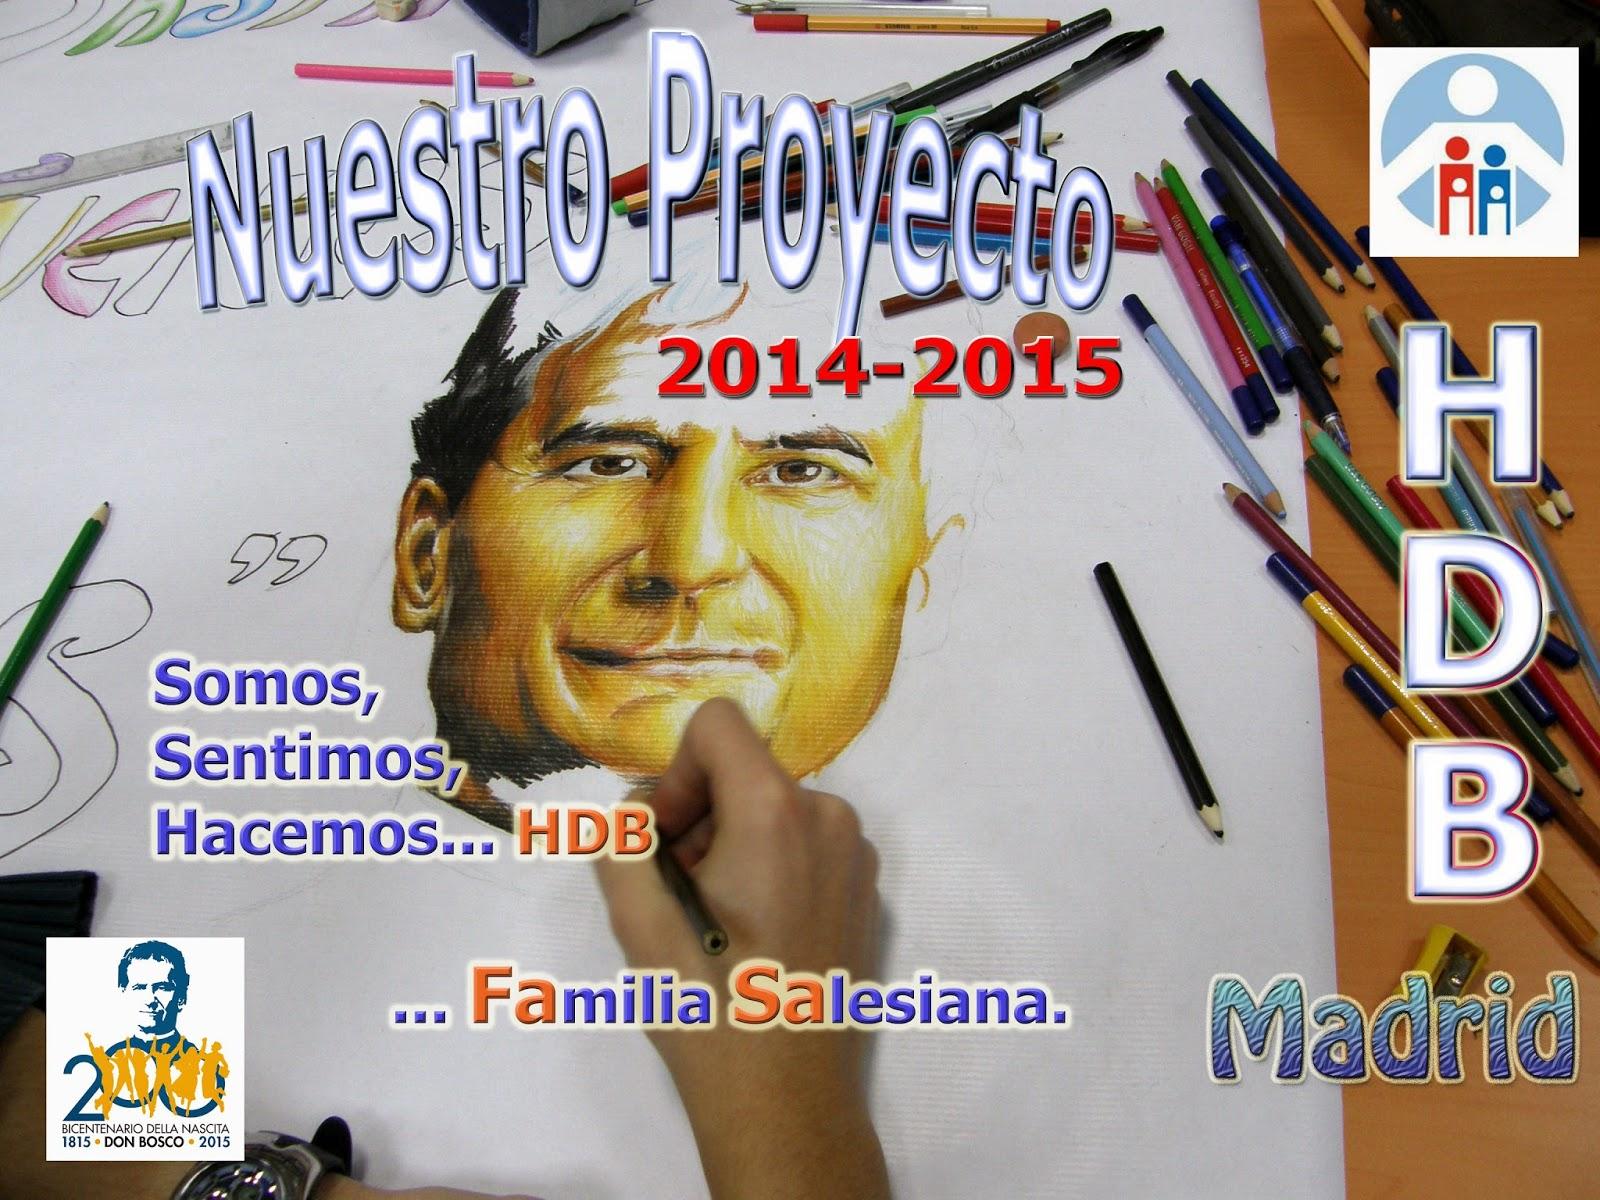 Presentación Proyecto HDB 2014-2015